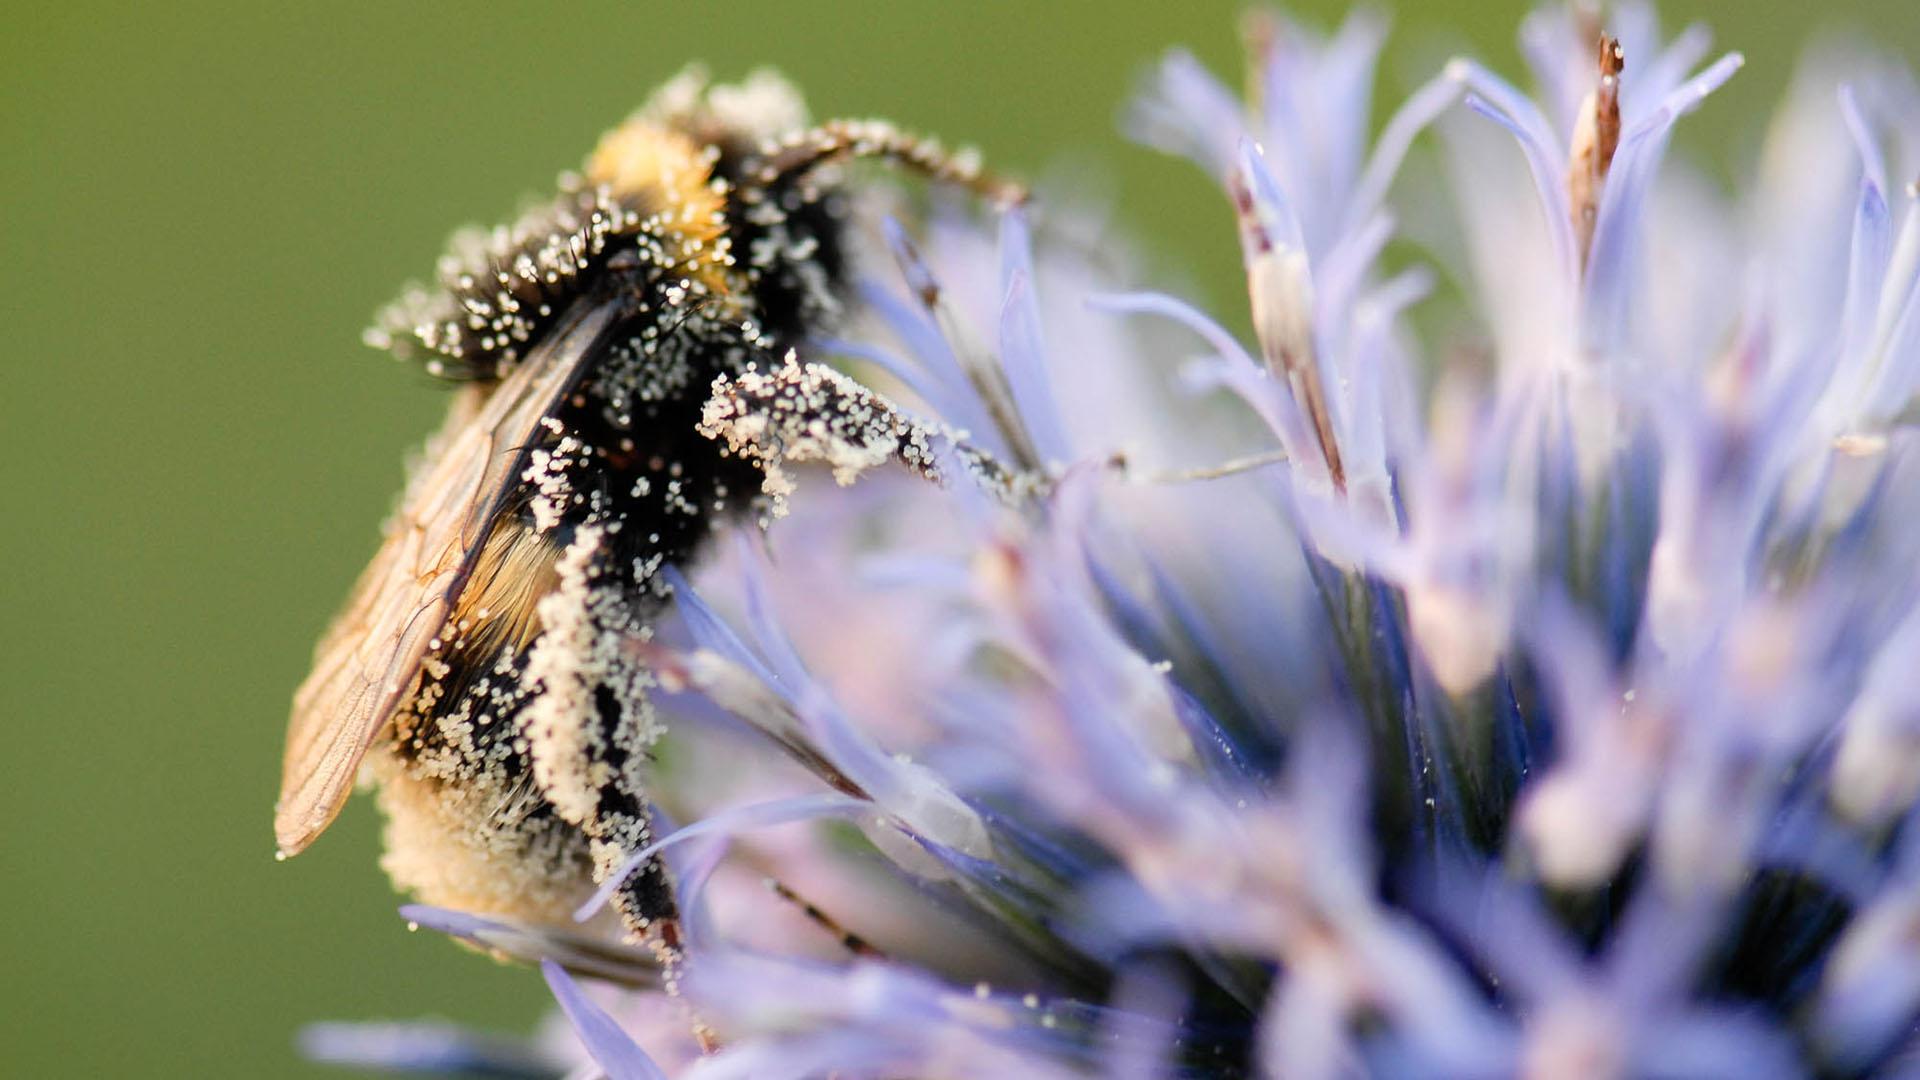 http://www.developpement-durable.gouv.fr/insectes-pollinisateurs/img/panneau1.jpg